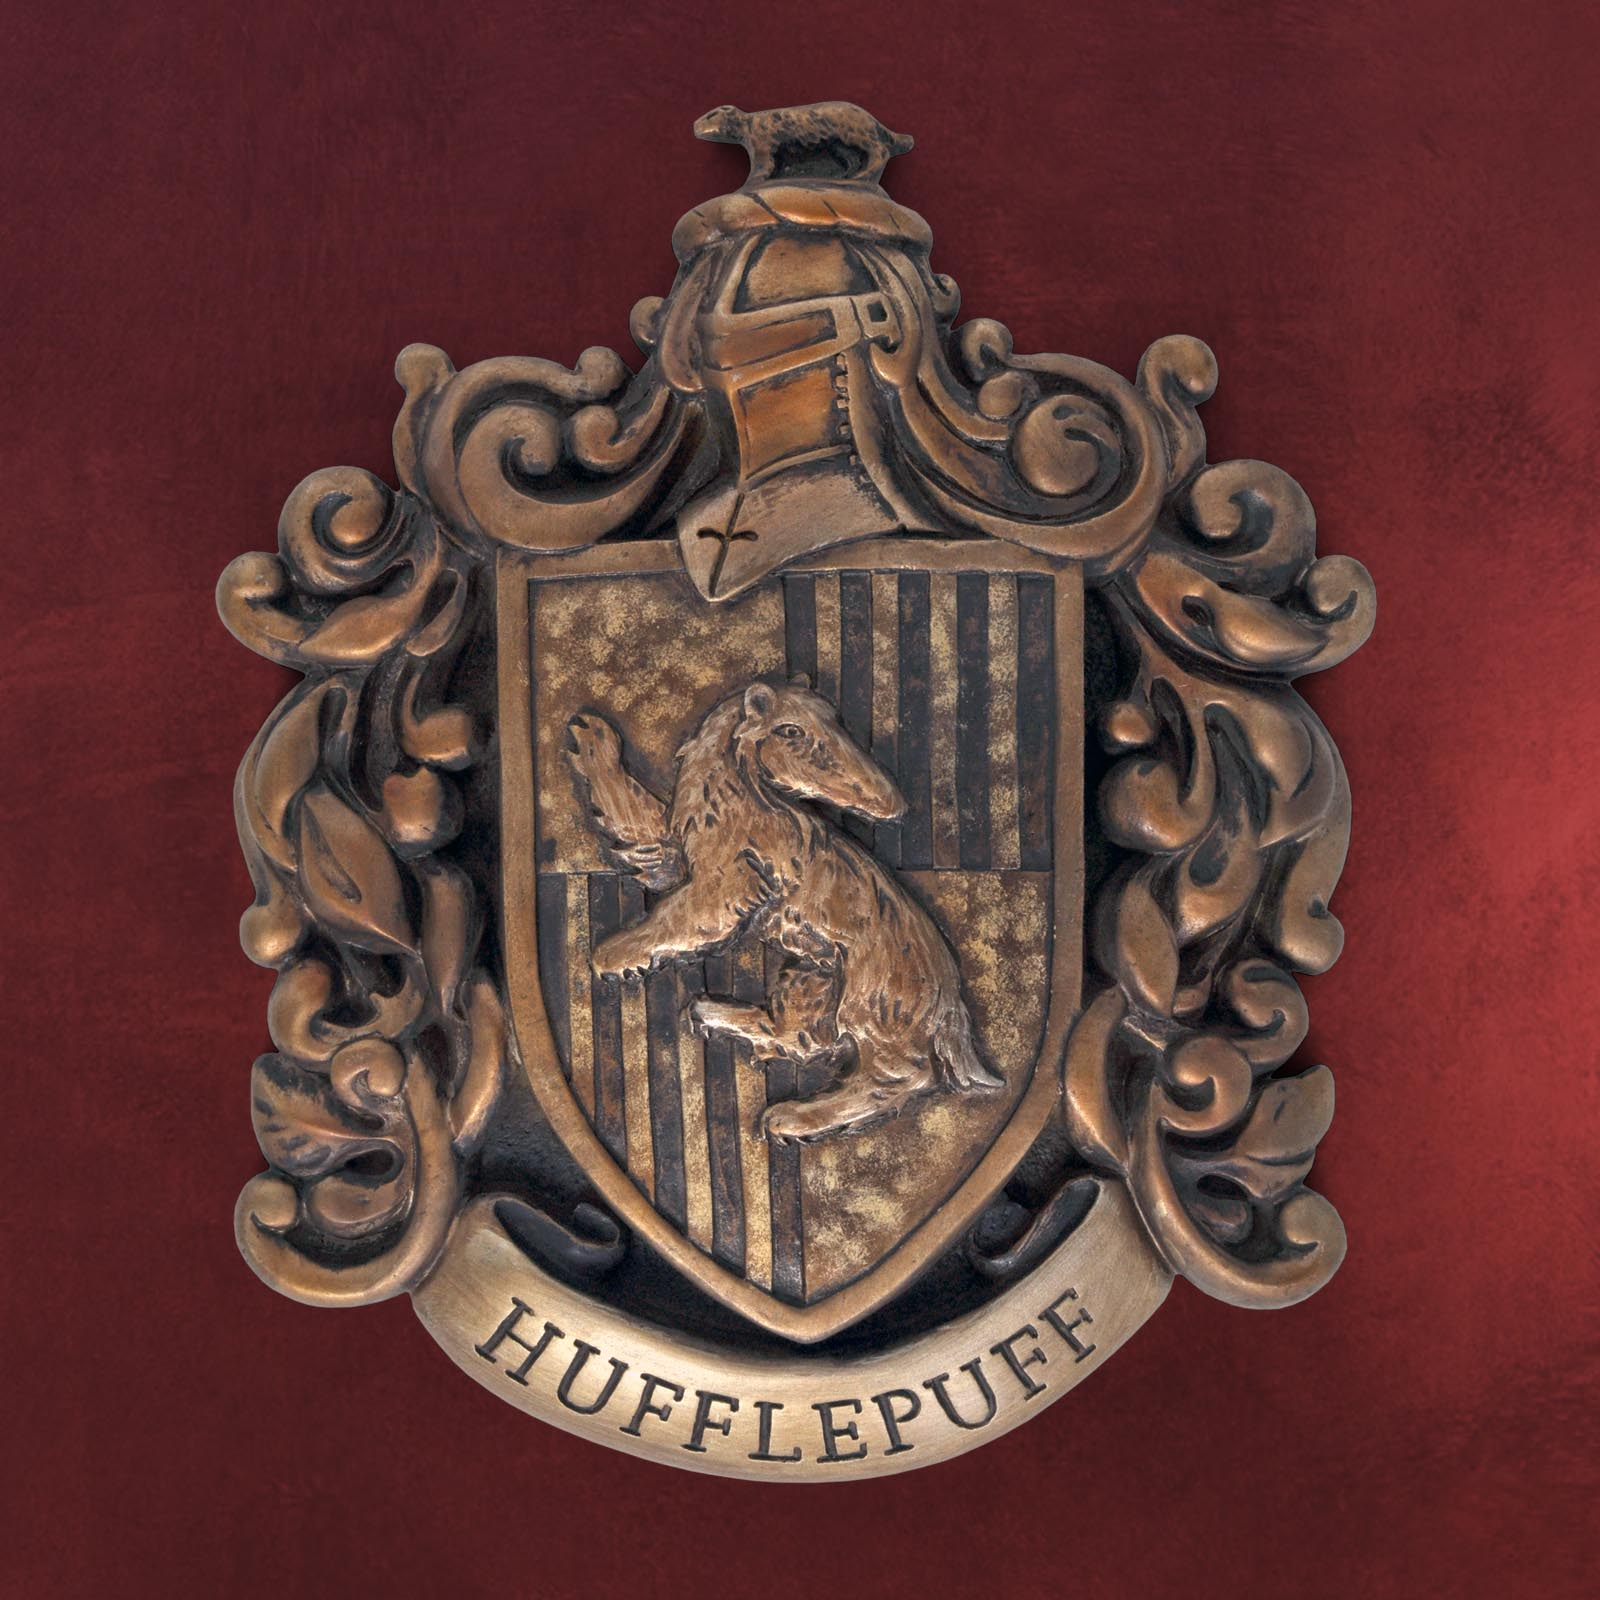 harry potter hufflepuff wappen wandbild deko f r hogwarts fans ebay. Black Bedroom Furniture Sets. Home Design Ideas